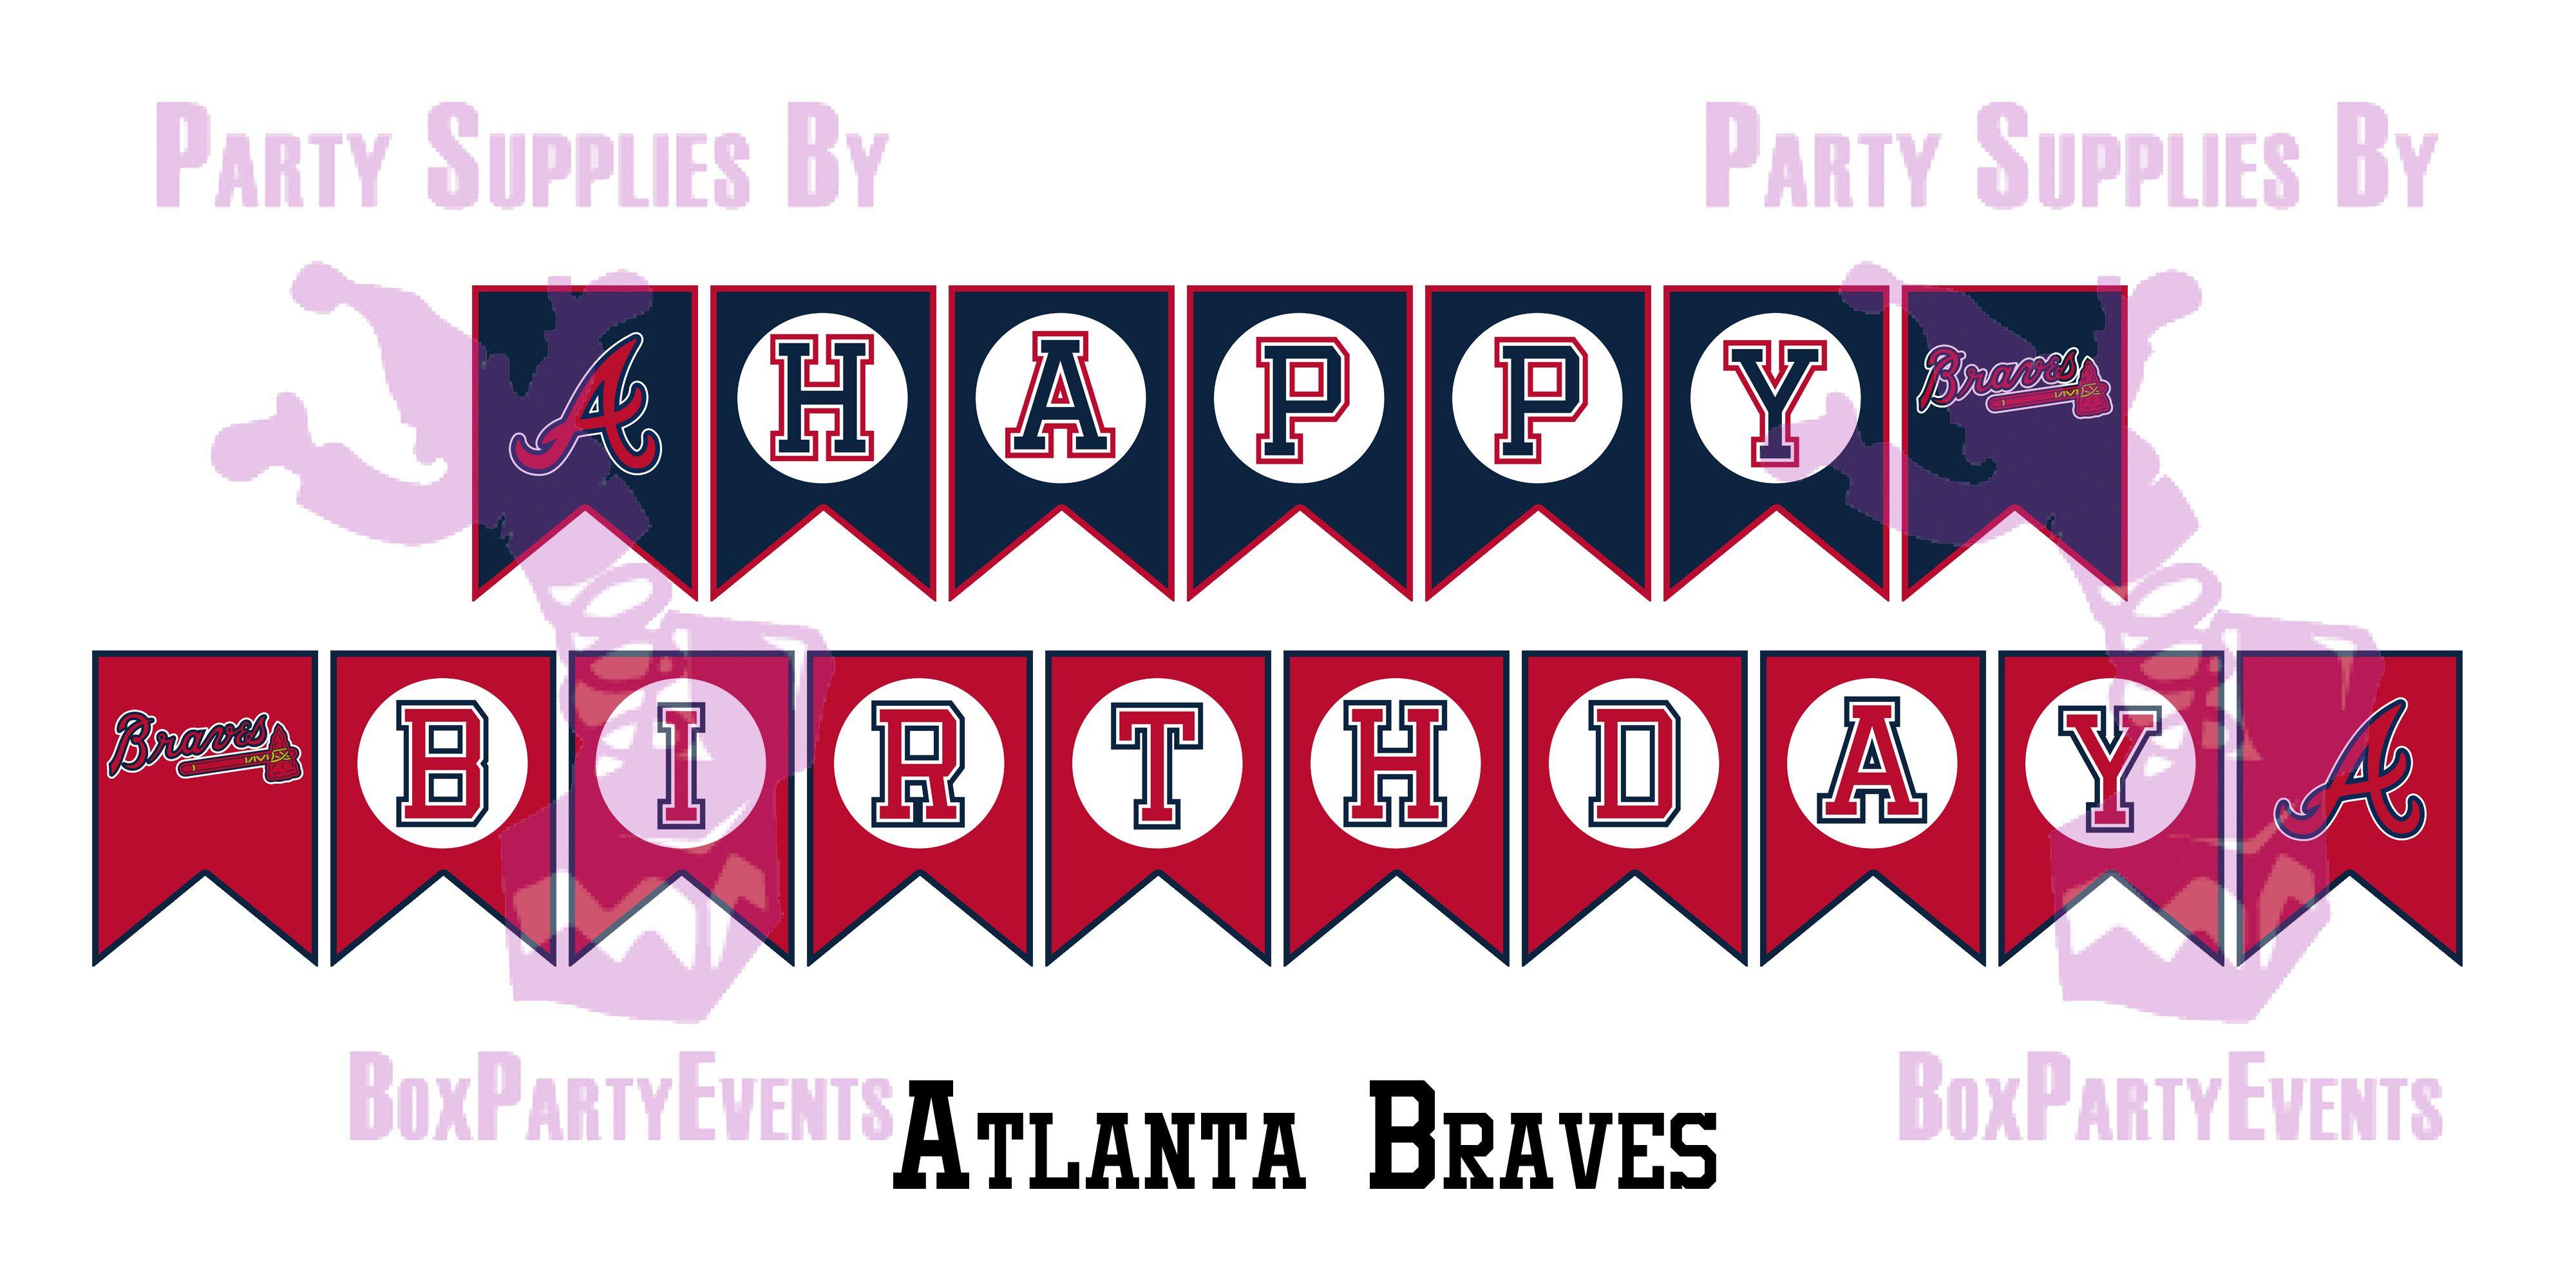 Atlanta Braves Diy Happy Birthday Banner In 2020 Happy Birthday Banners Happy Birthday Banner Diy Birthday Banner